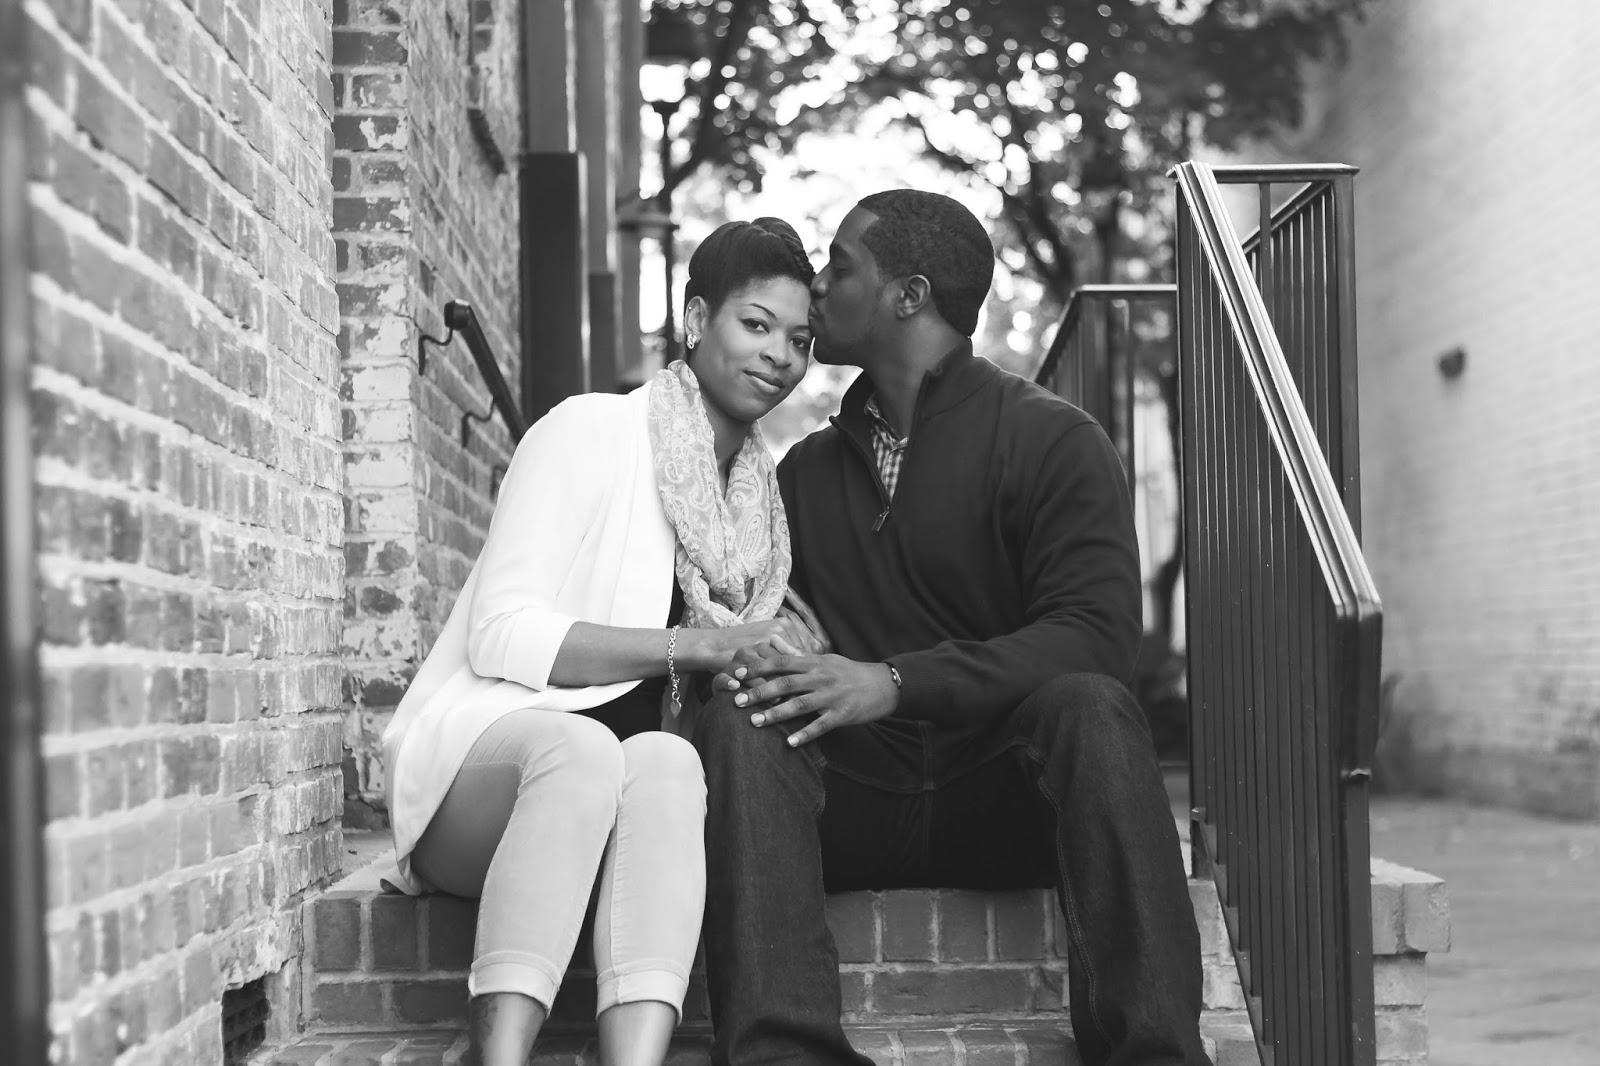 bryant-tyson-photography-mini-couples-session-greenville-nc-photographer-chris-courtney-8.jpg